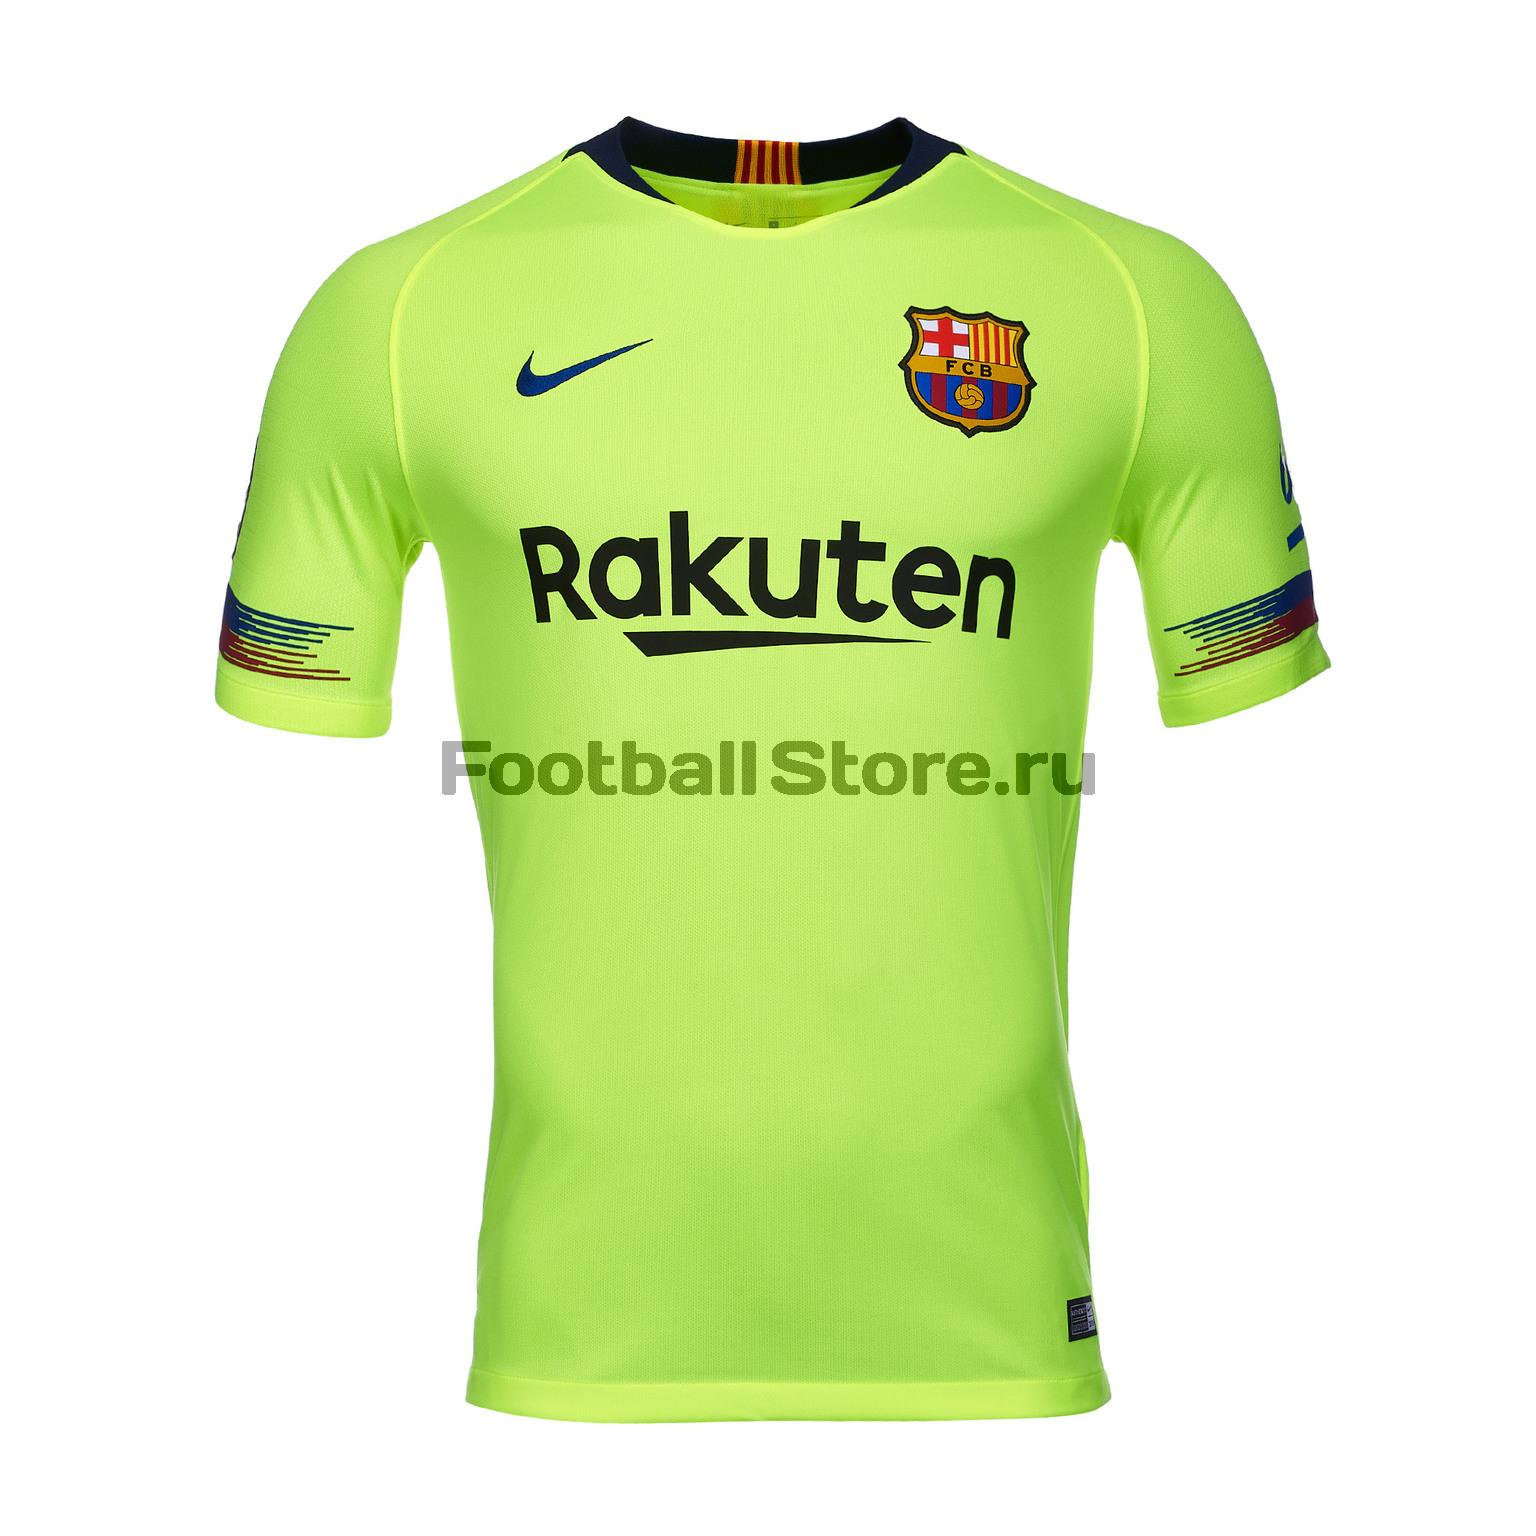 Футболка выездная игровая Nike Barcelona 2018/19 футболка игровая домашняя nike barcelona 2018 19